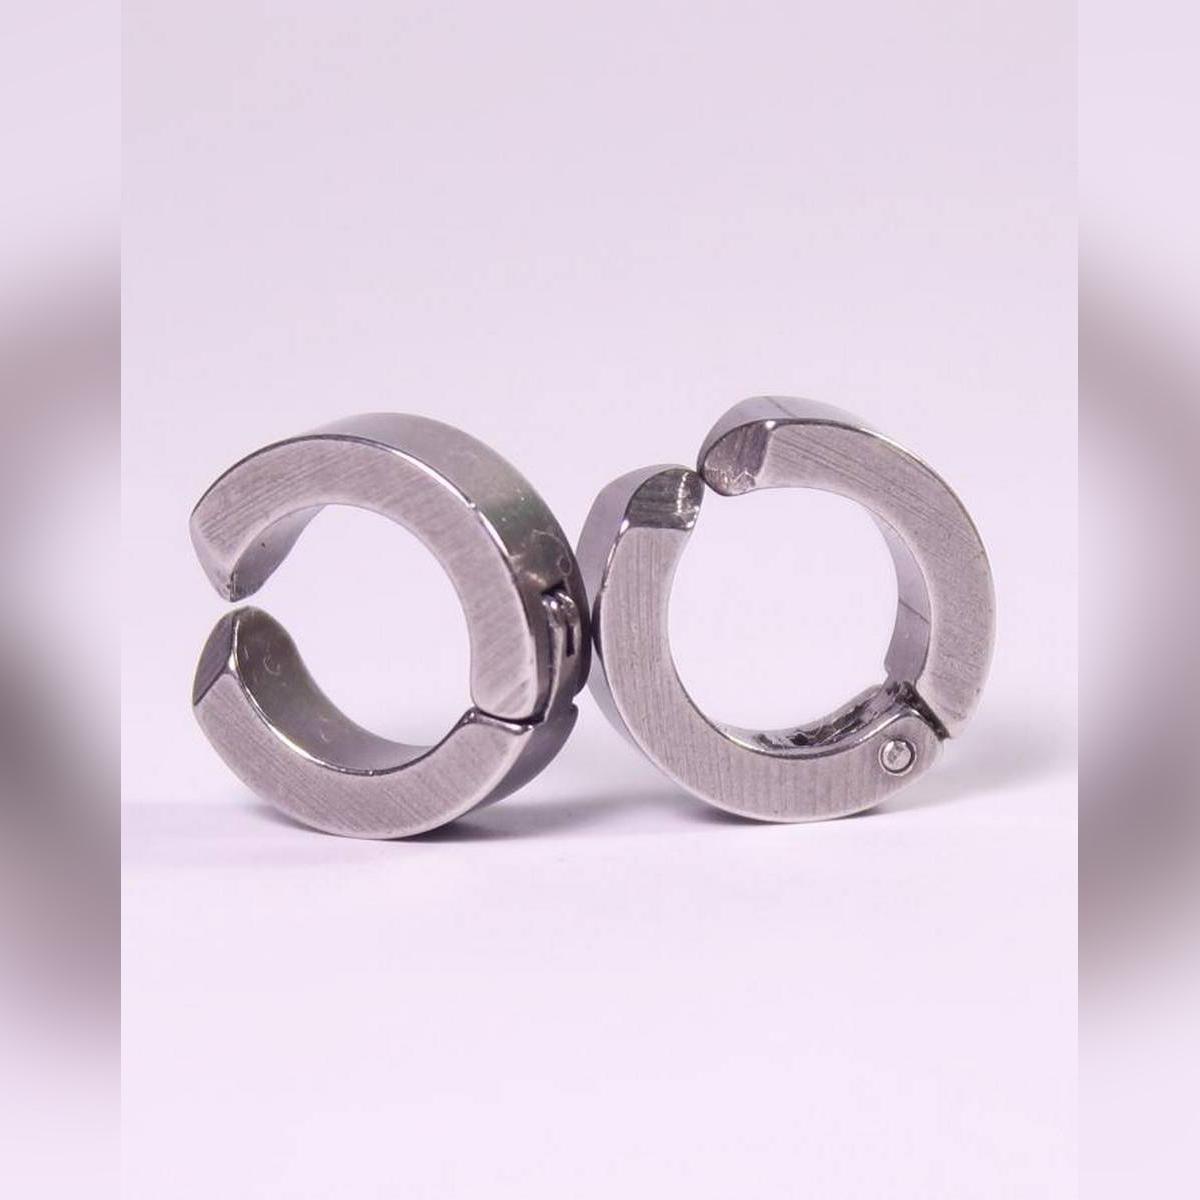 Punk Clip Earrings For Men